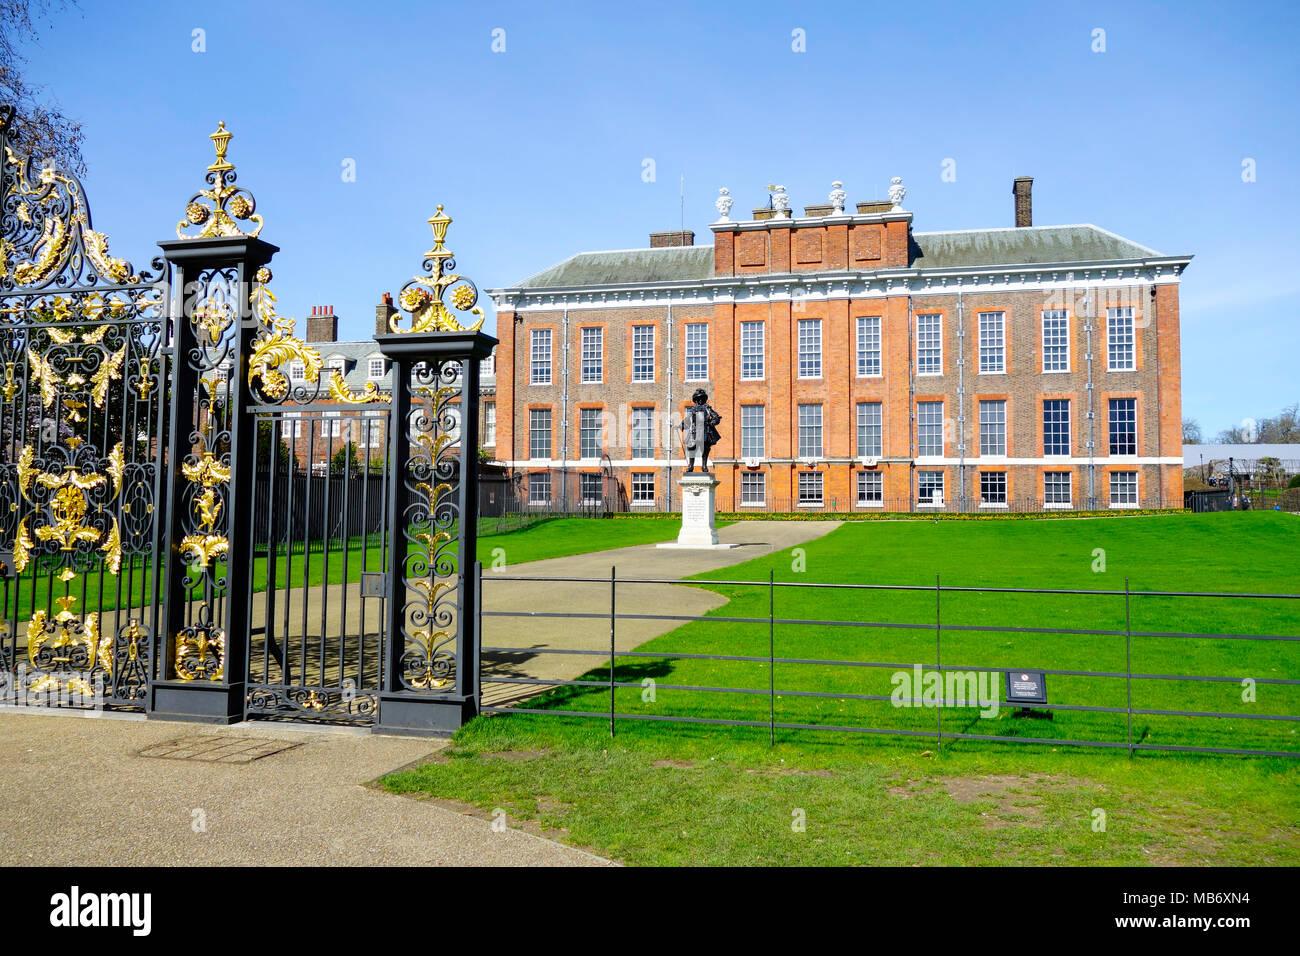 Kensington Palace, Kensington Gardens, London, England, Vereinigtes Königreich, Europa Stockbild